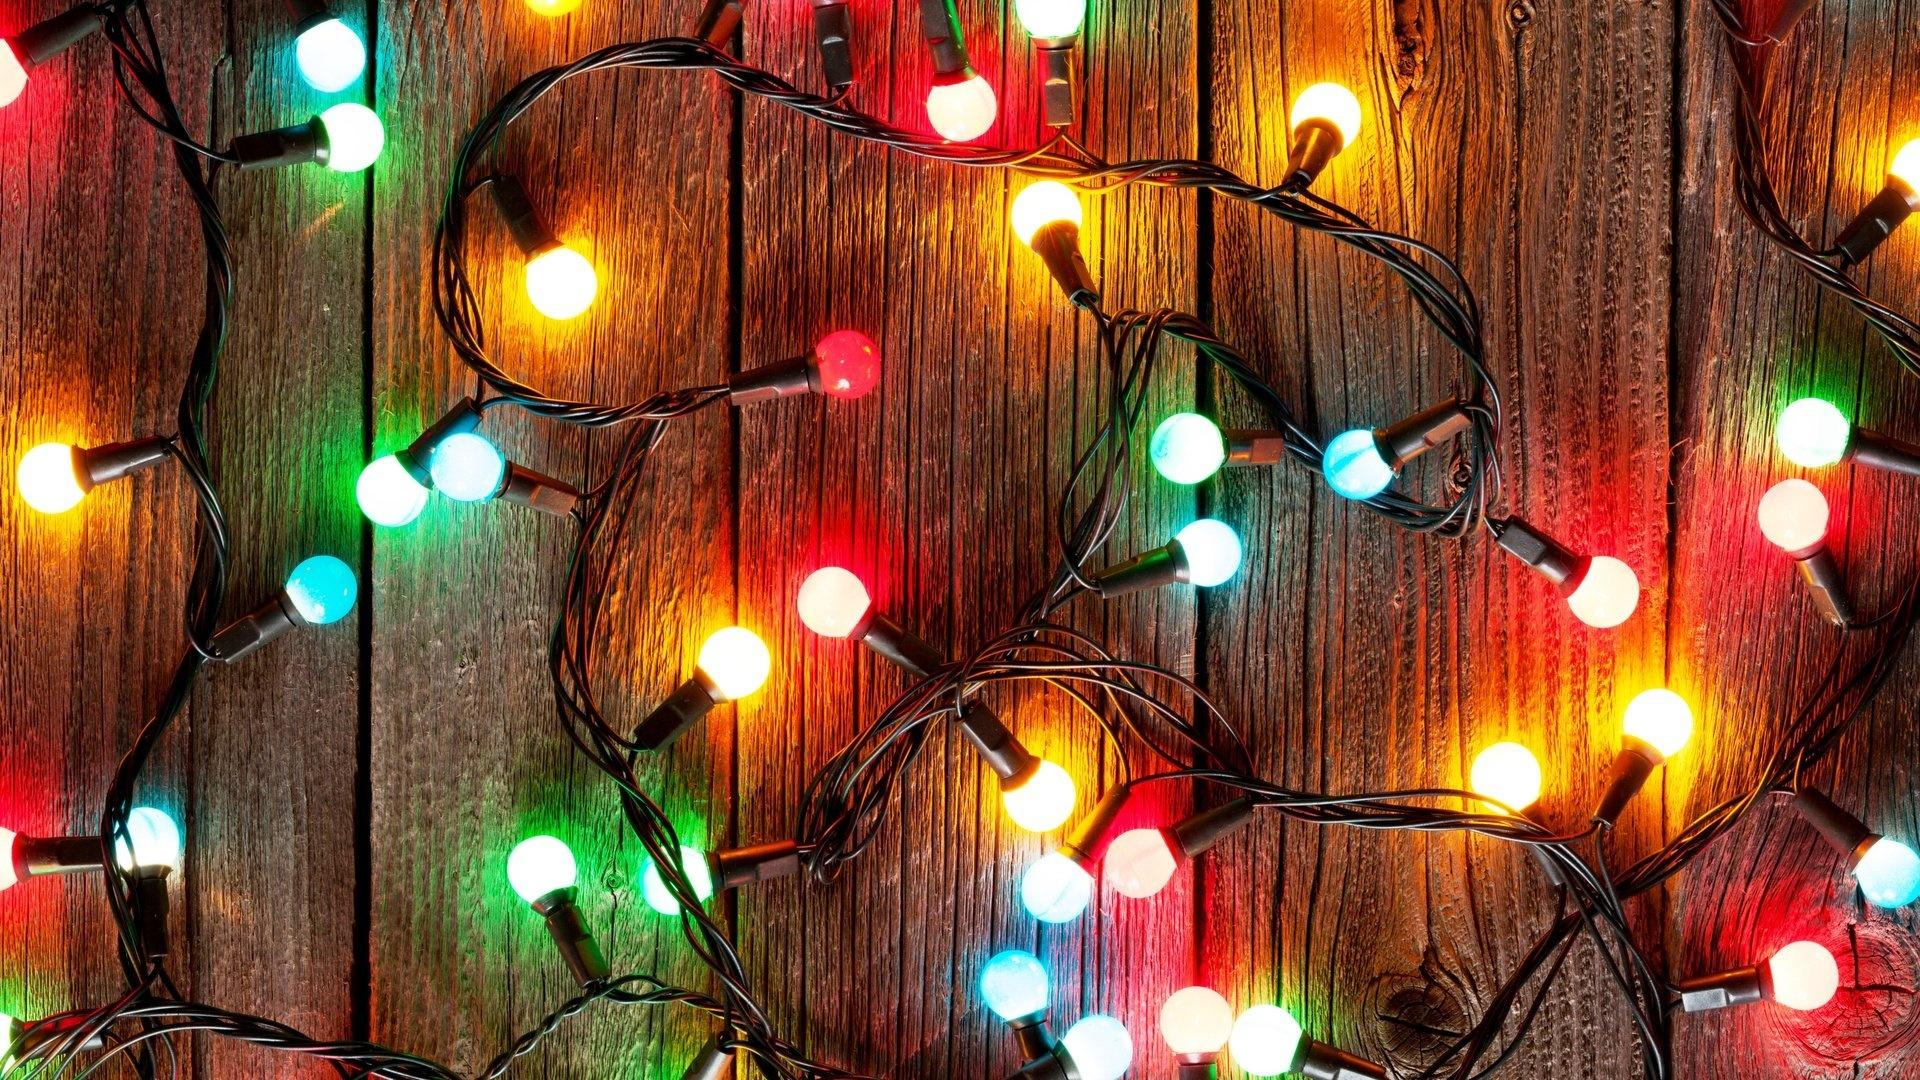 Light Up free download wallpaper